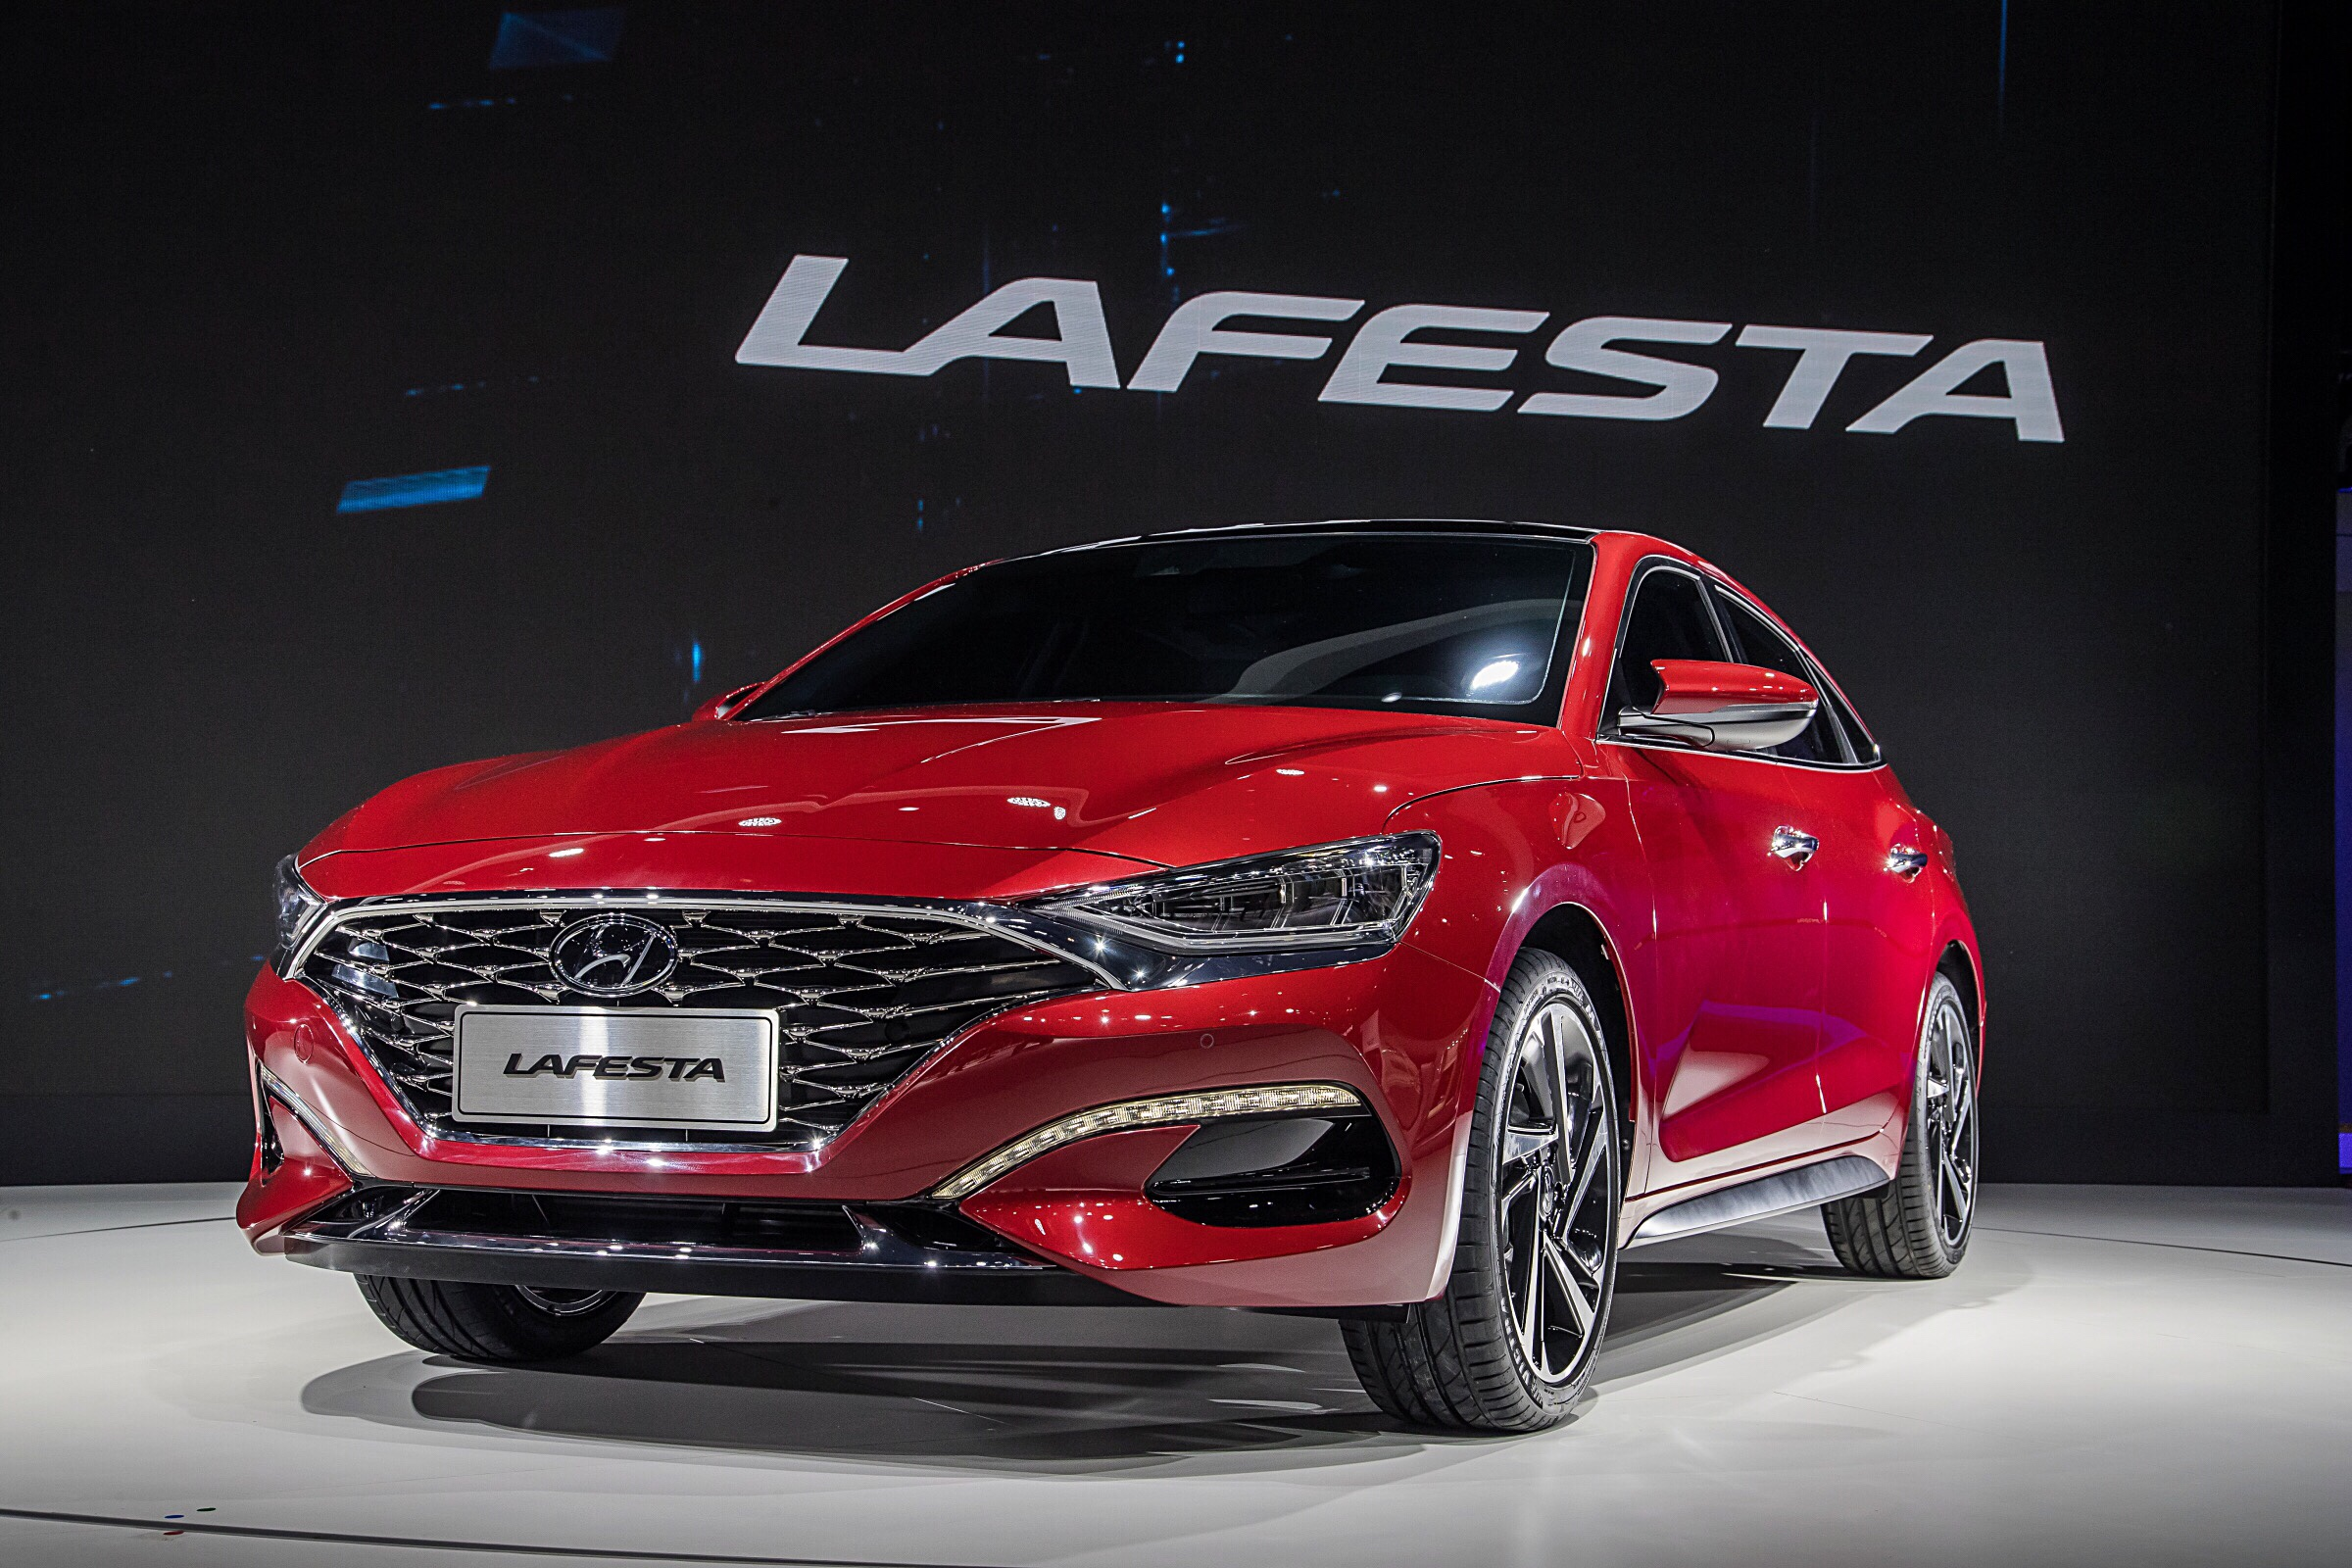 Hyundai Unveils Lafesta Sporty Sedan for China